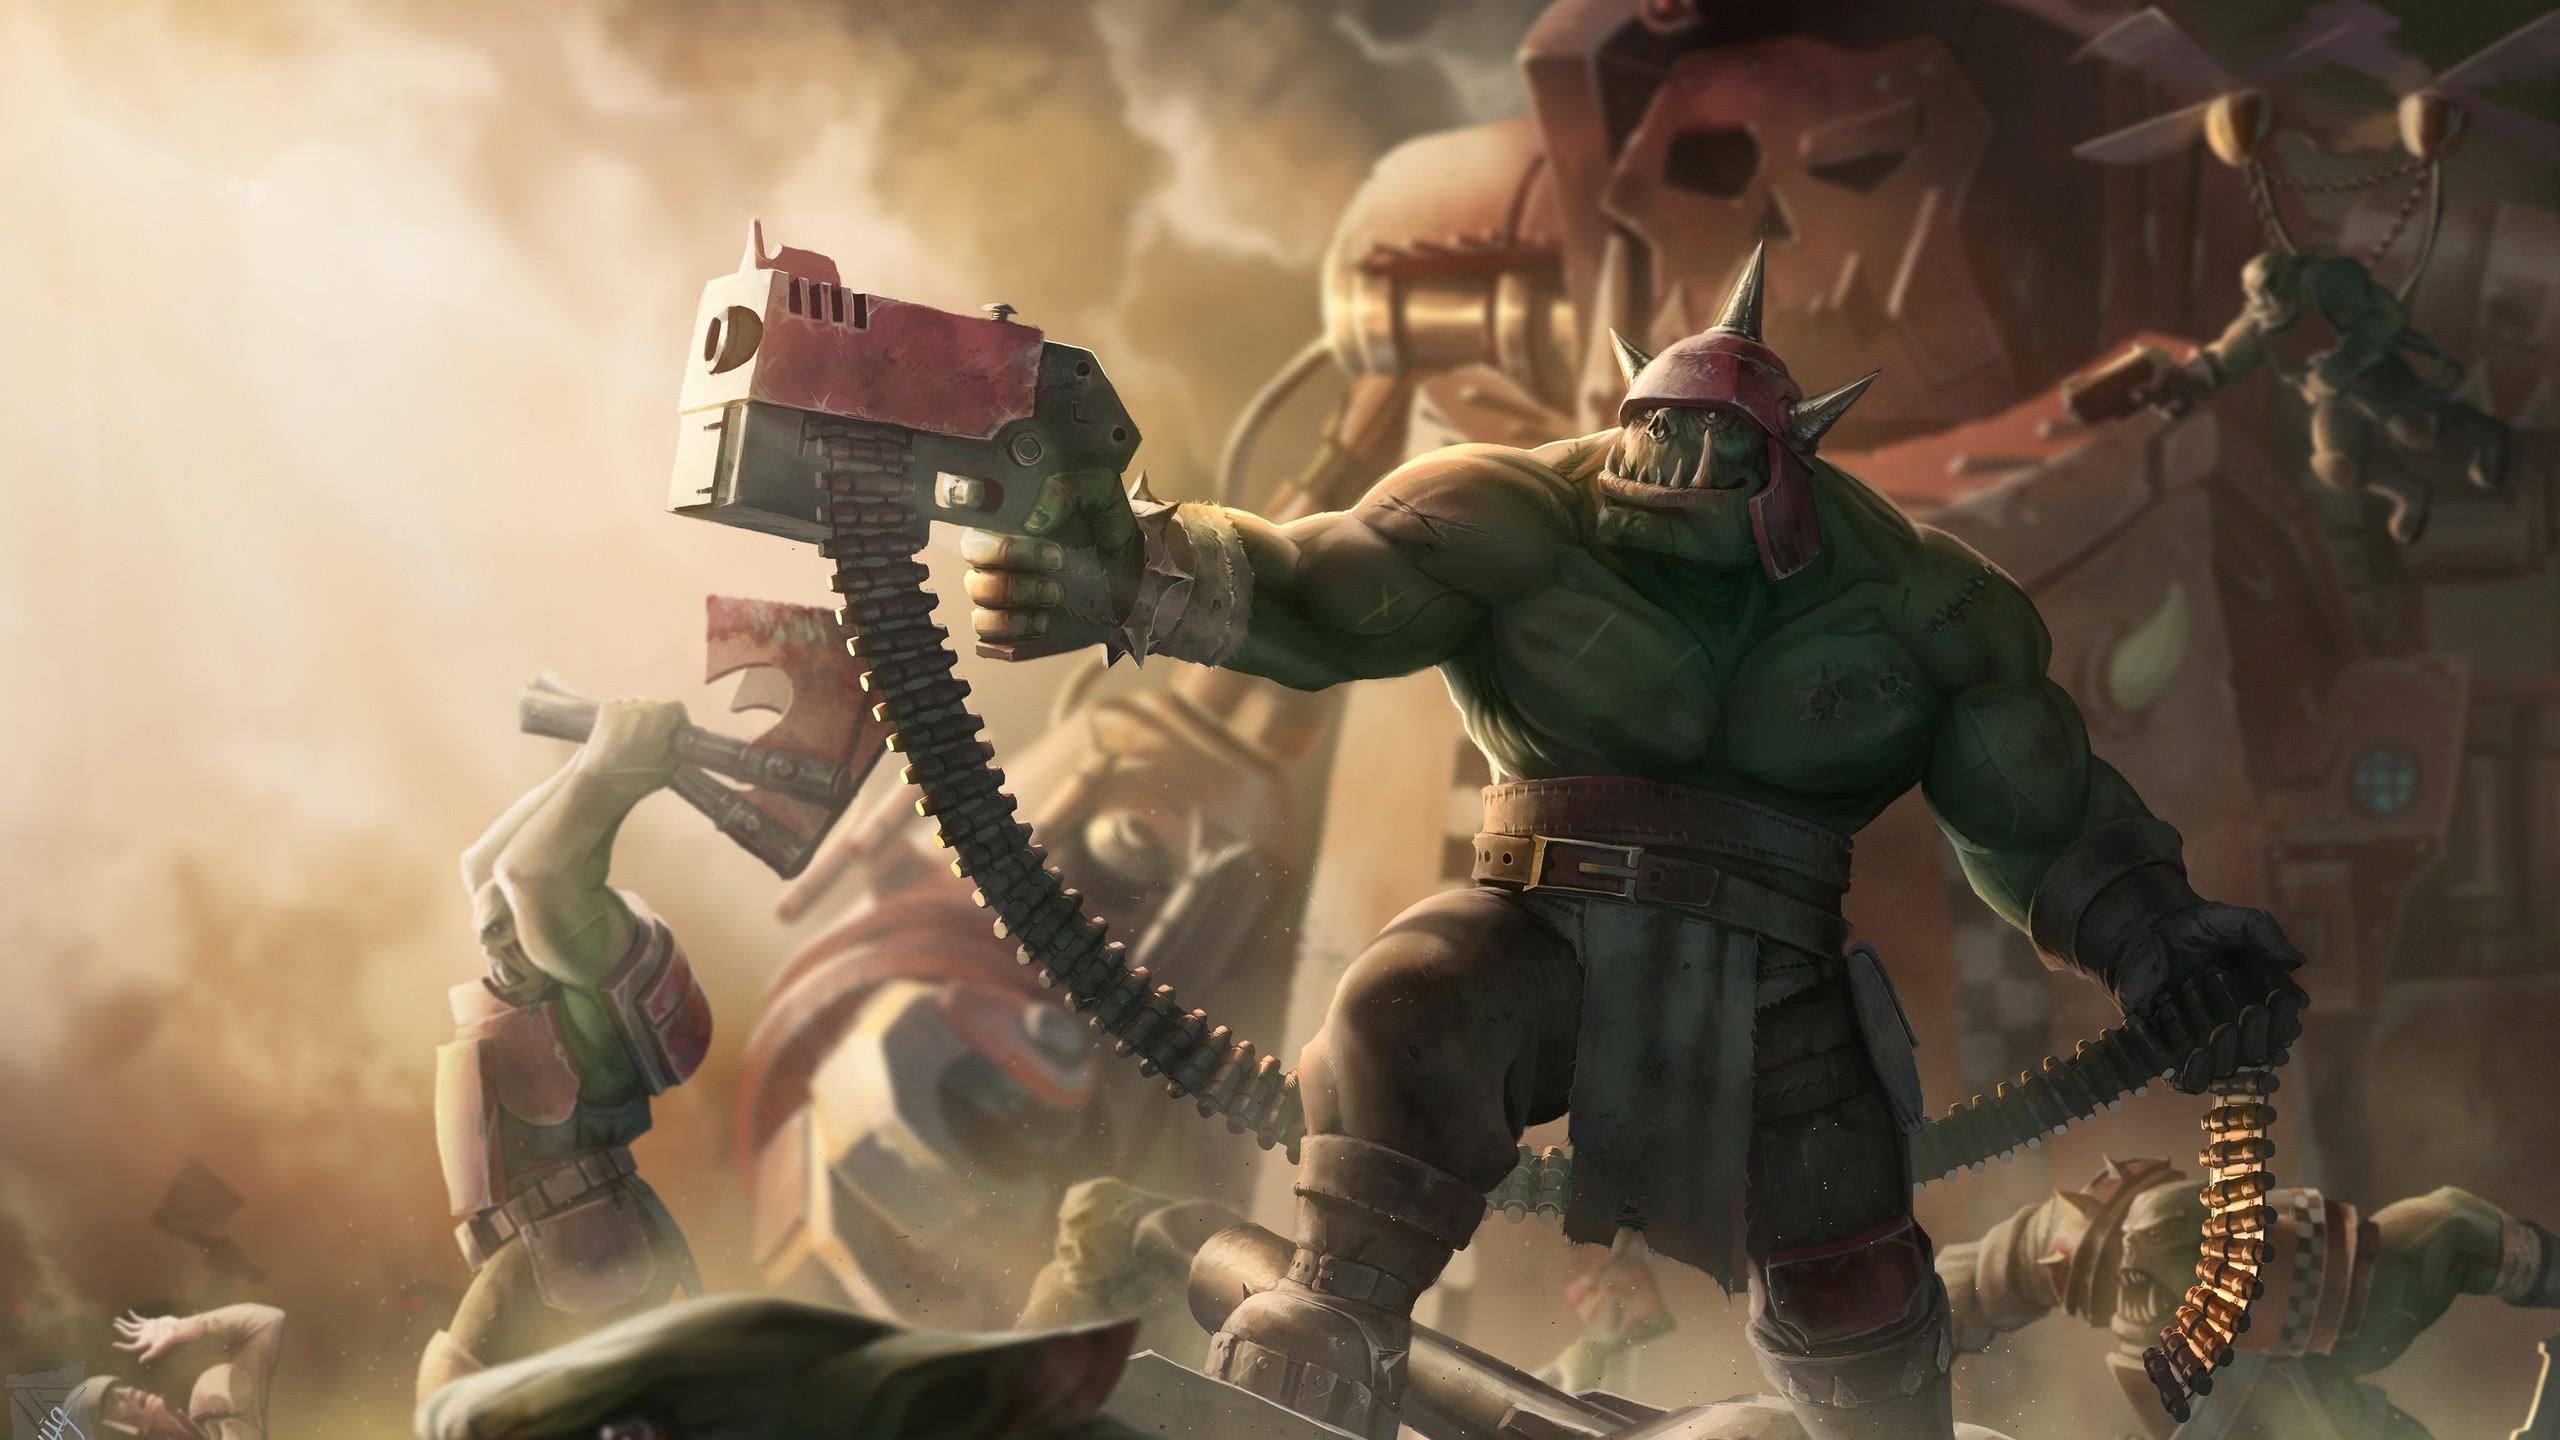 warhammer-40k-ork-26.jpg